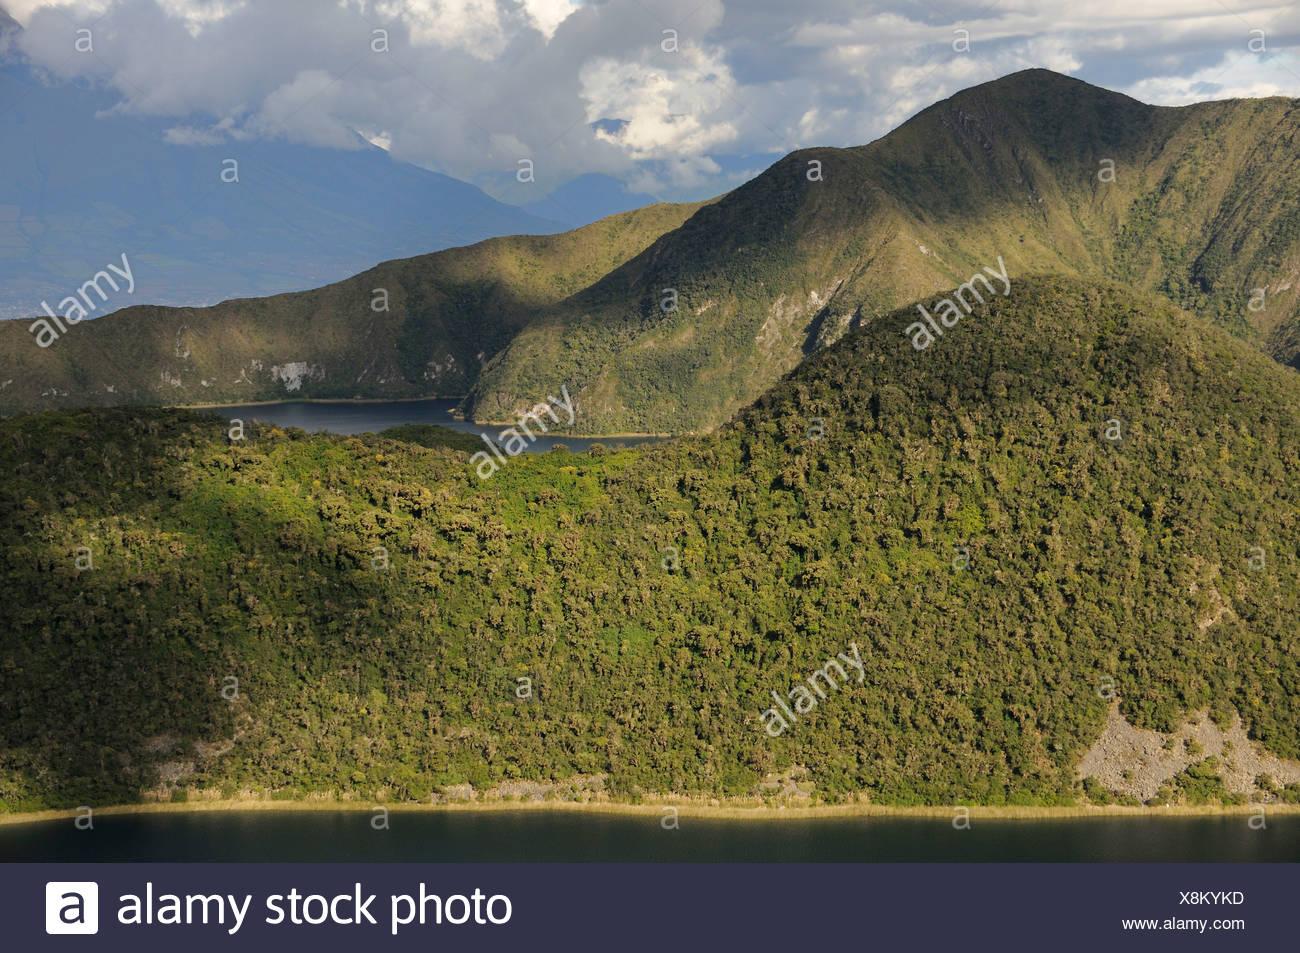 Ecuador Cuicocha Crater Lake Volcano Cotacachi Andes Mountains volcanic landscape scenery island nature mountain caldera Stock Photo